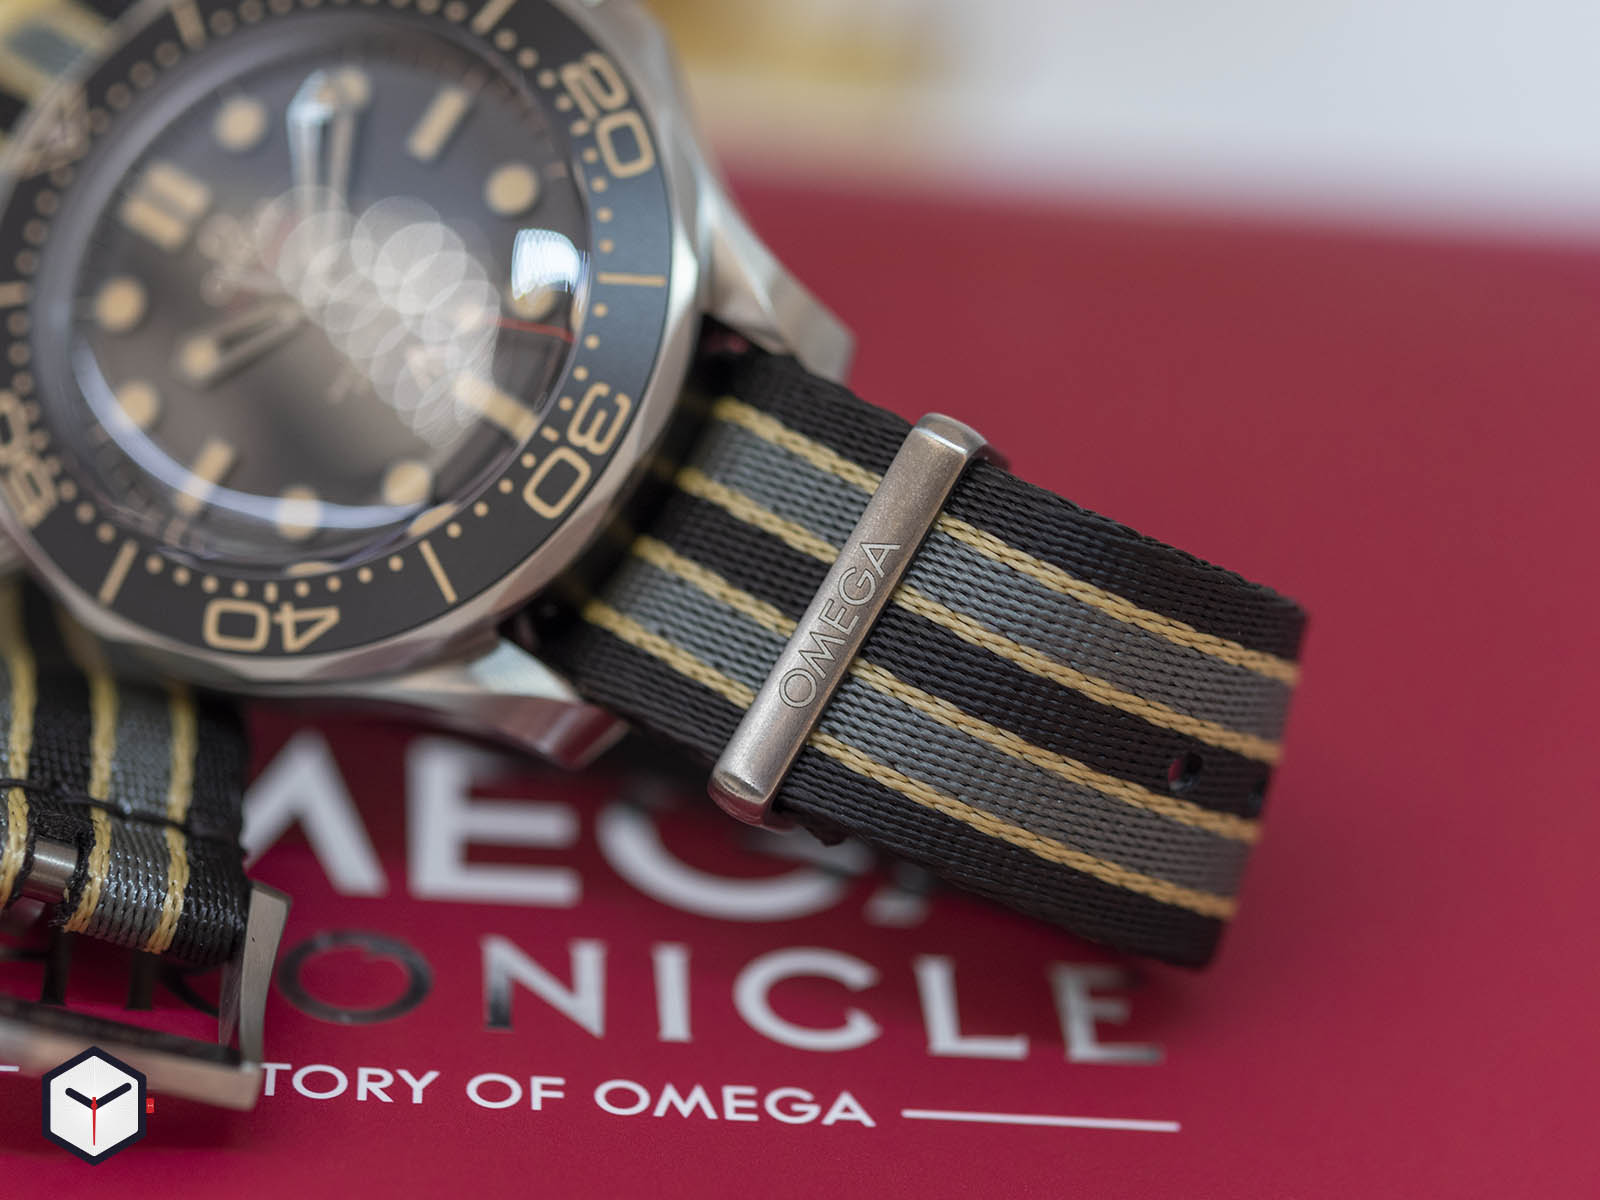 omega-seamaster-diver-300m-007-edition-9.jpg